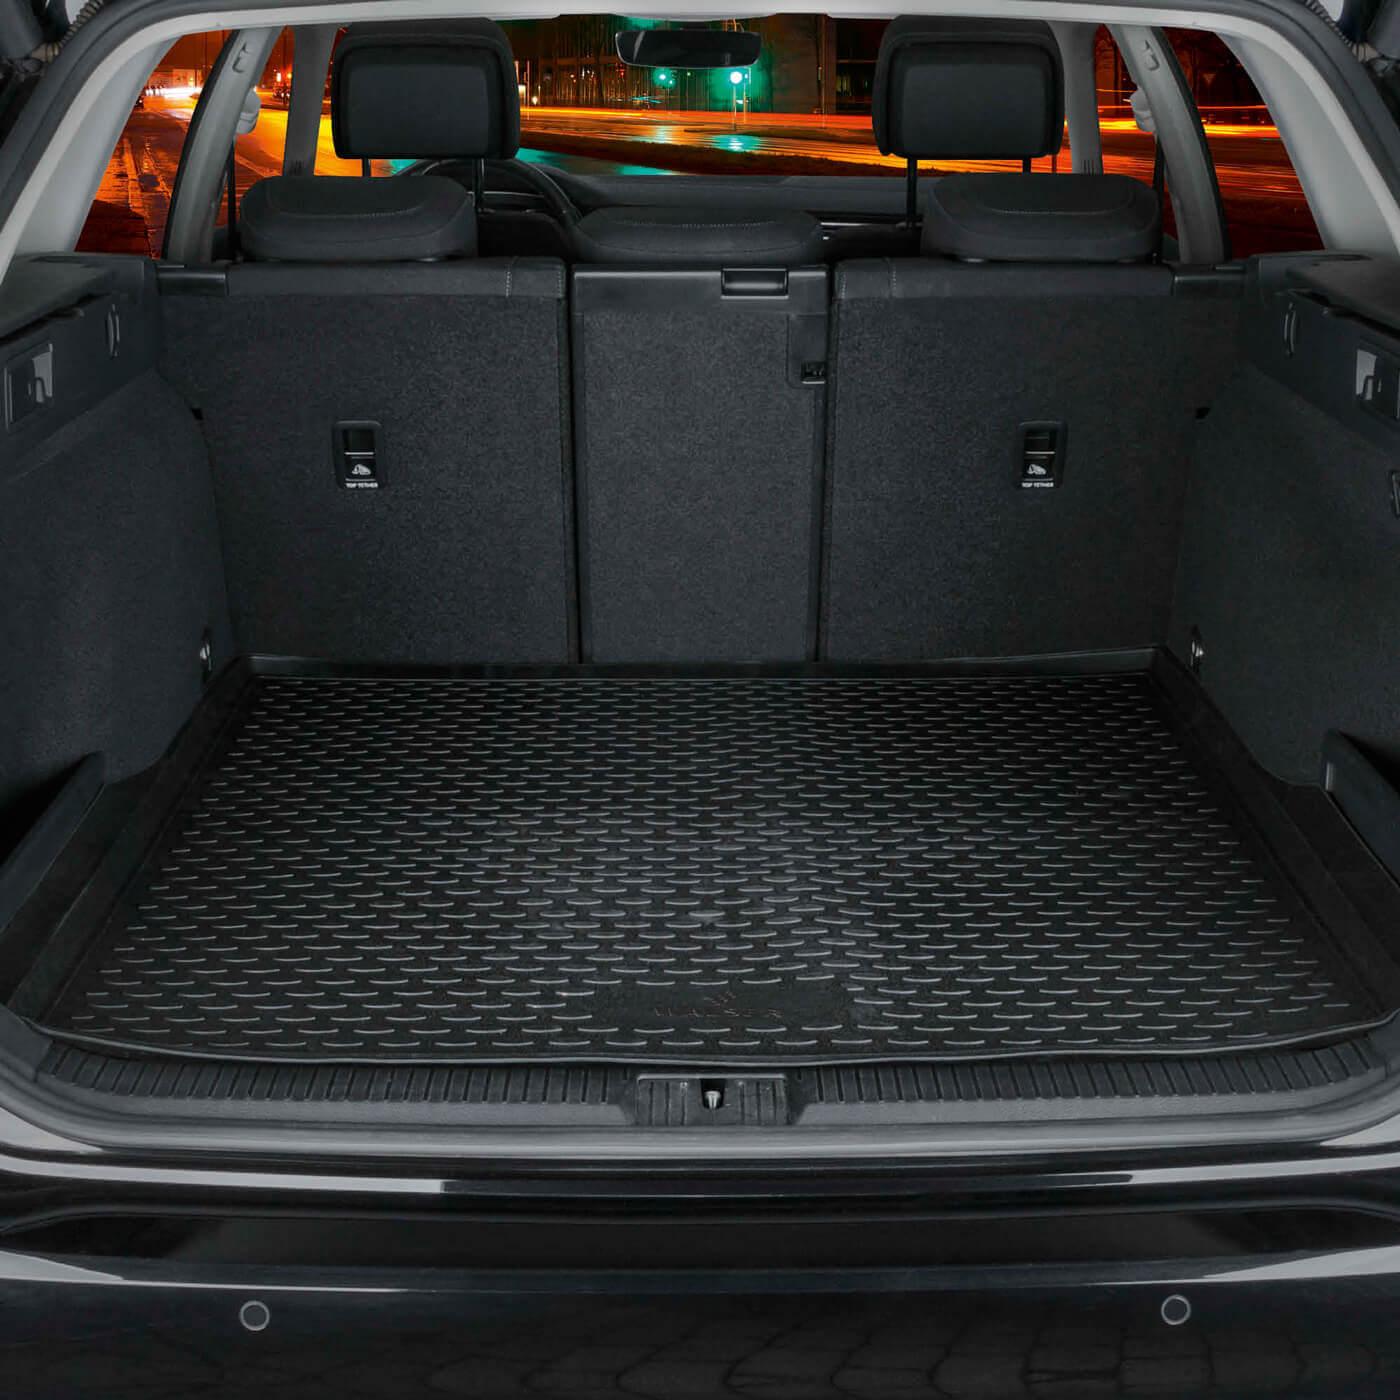 XTR - car mats for the boot